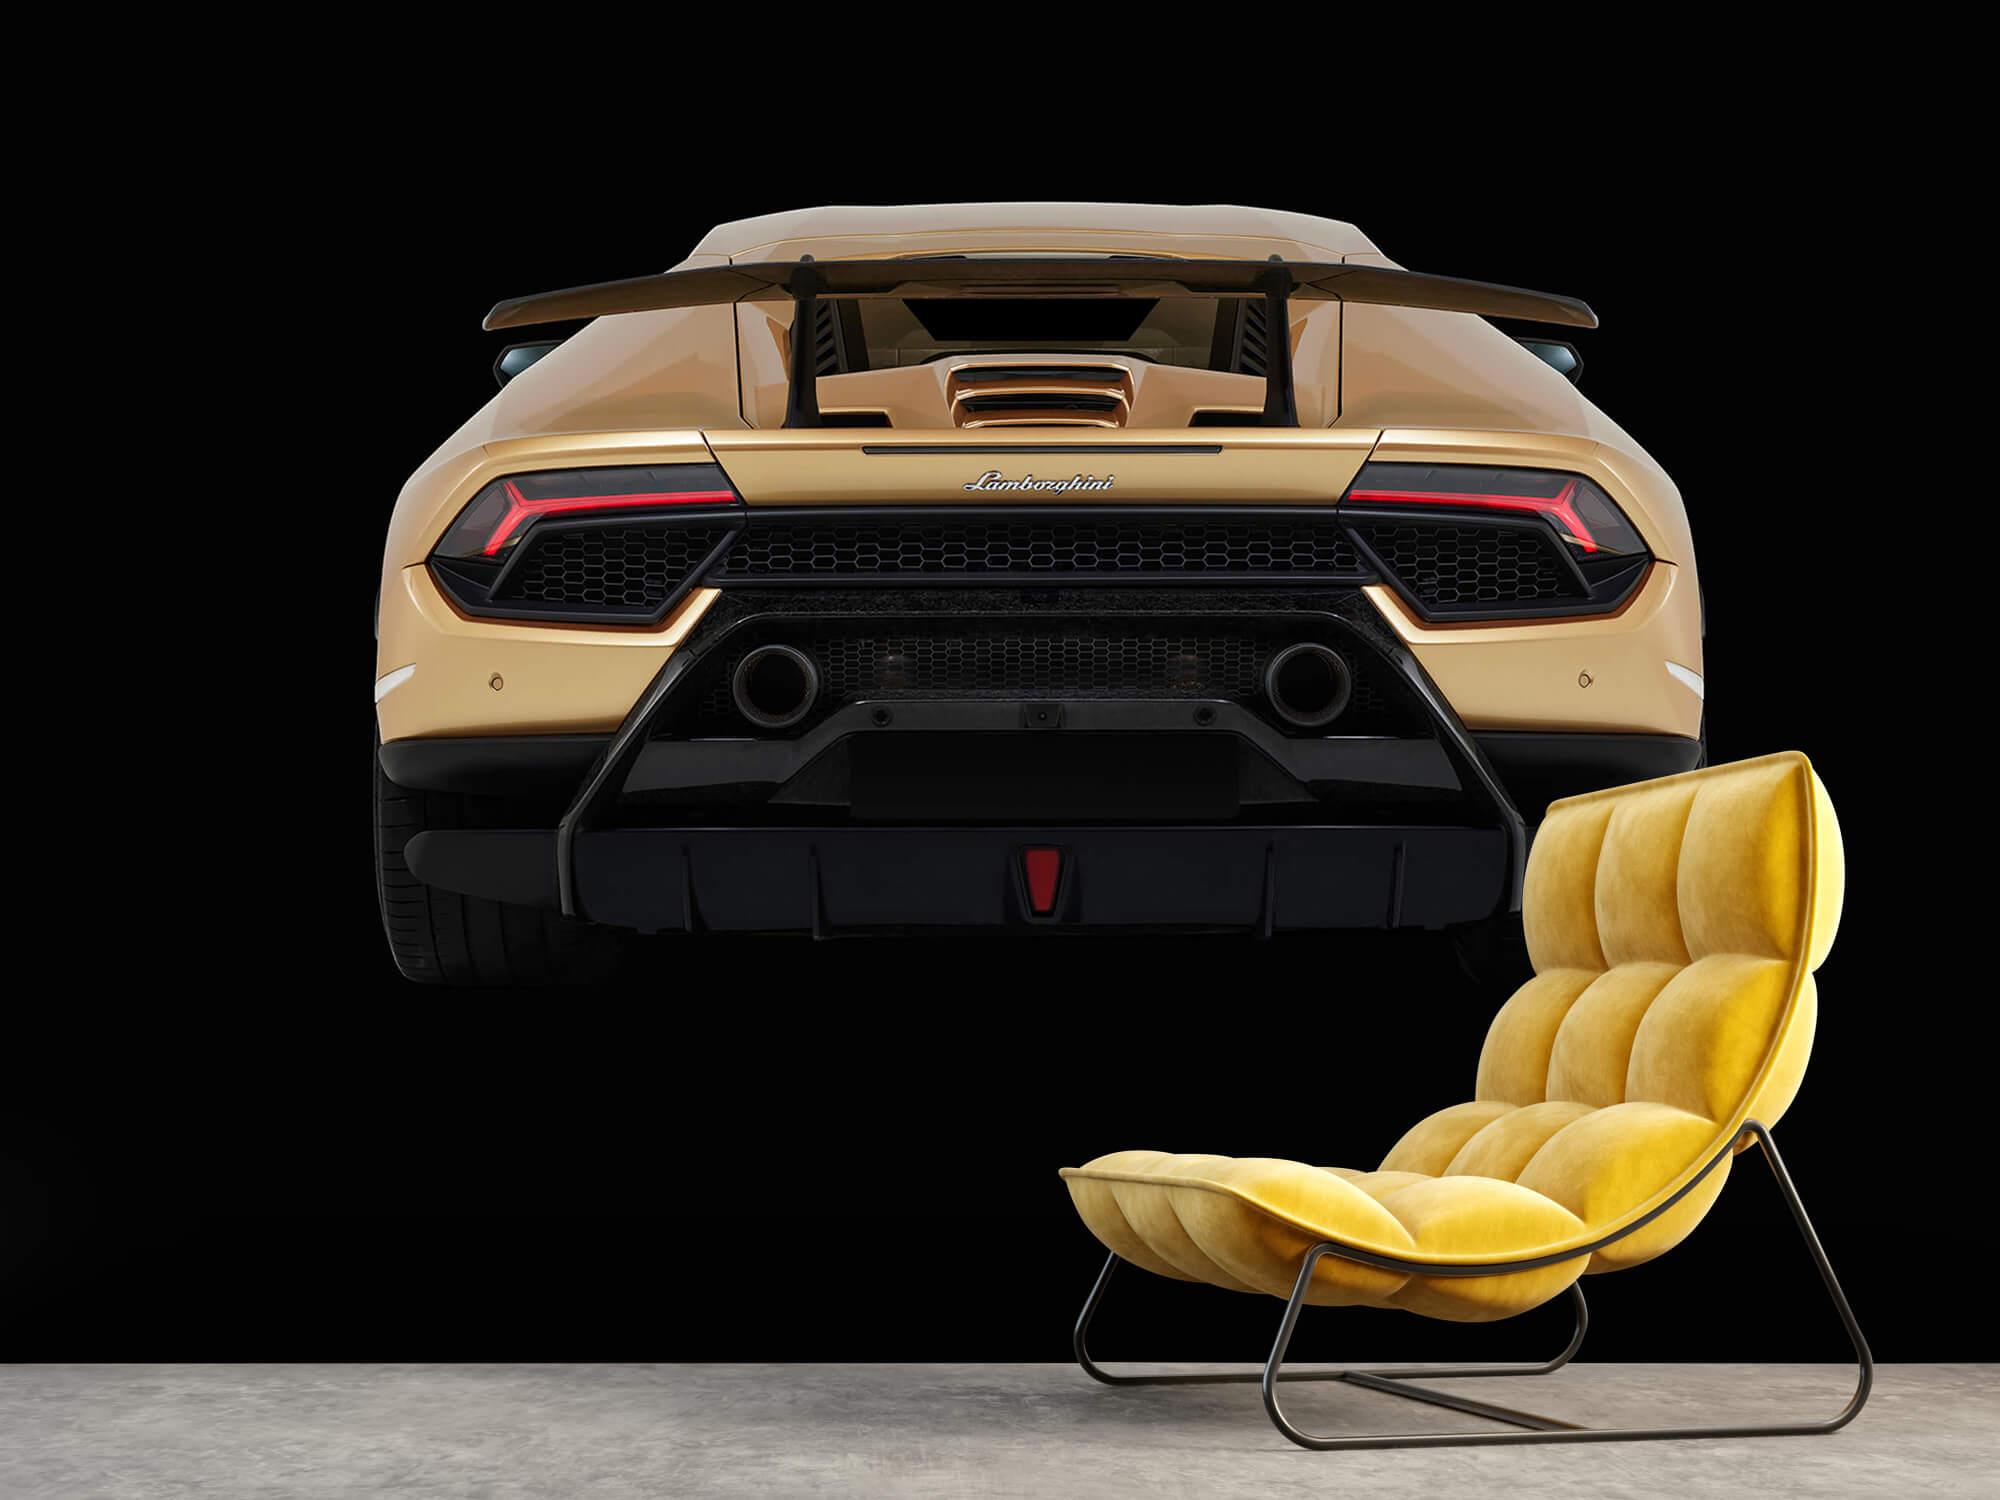 Wallpaper Lamborghini Huracán - Rear view, black 10